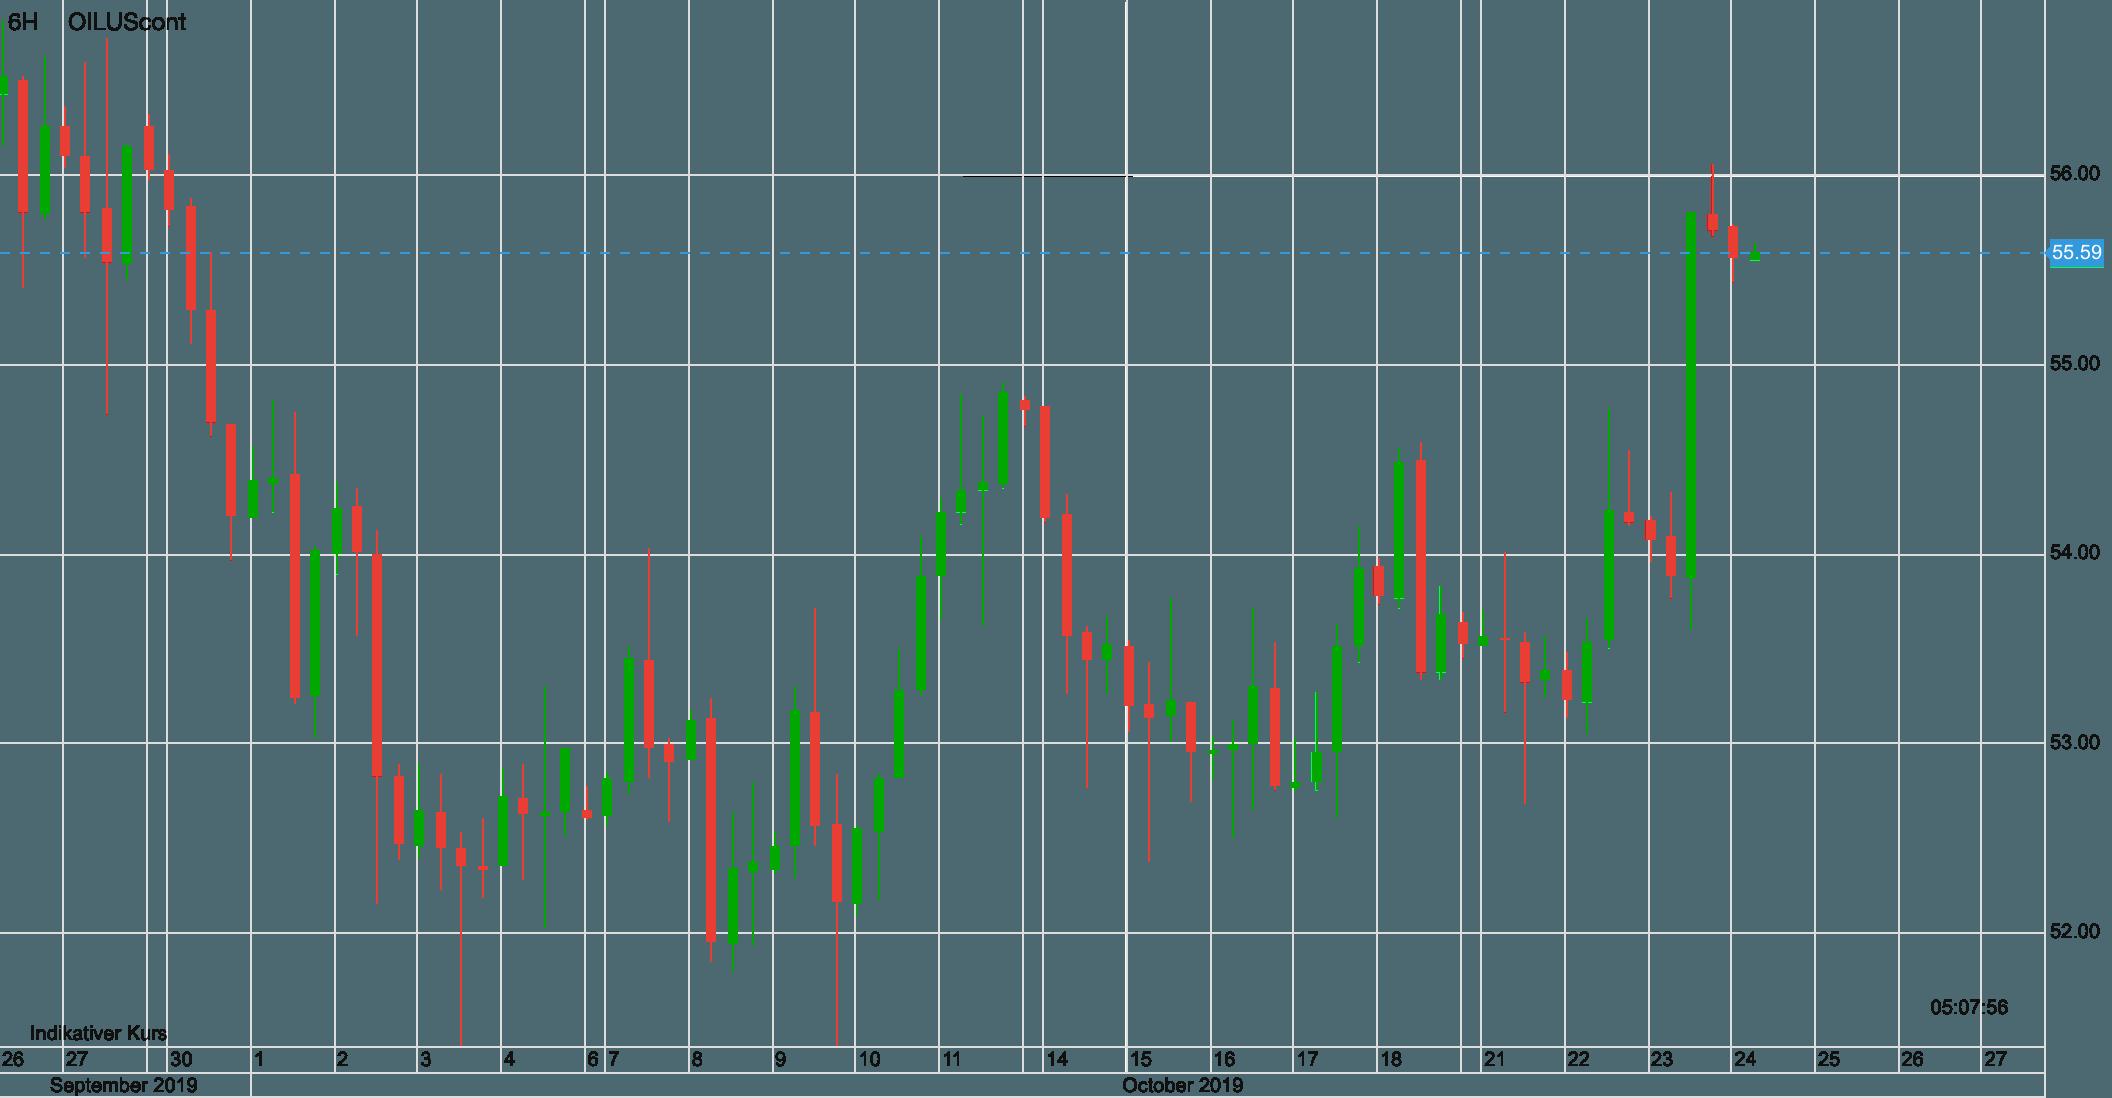 Ölpreis WTI seit dem 26. September